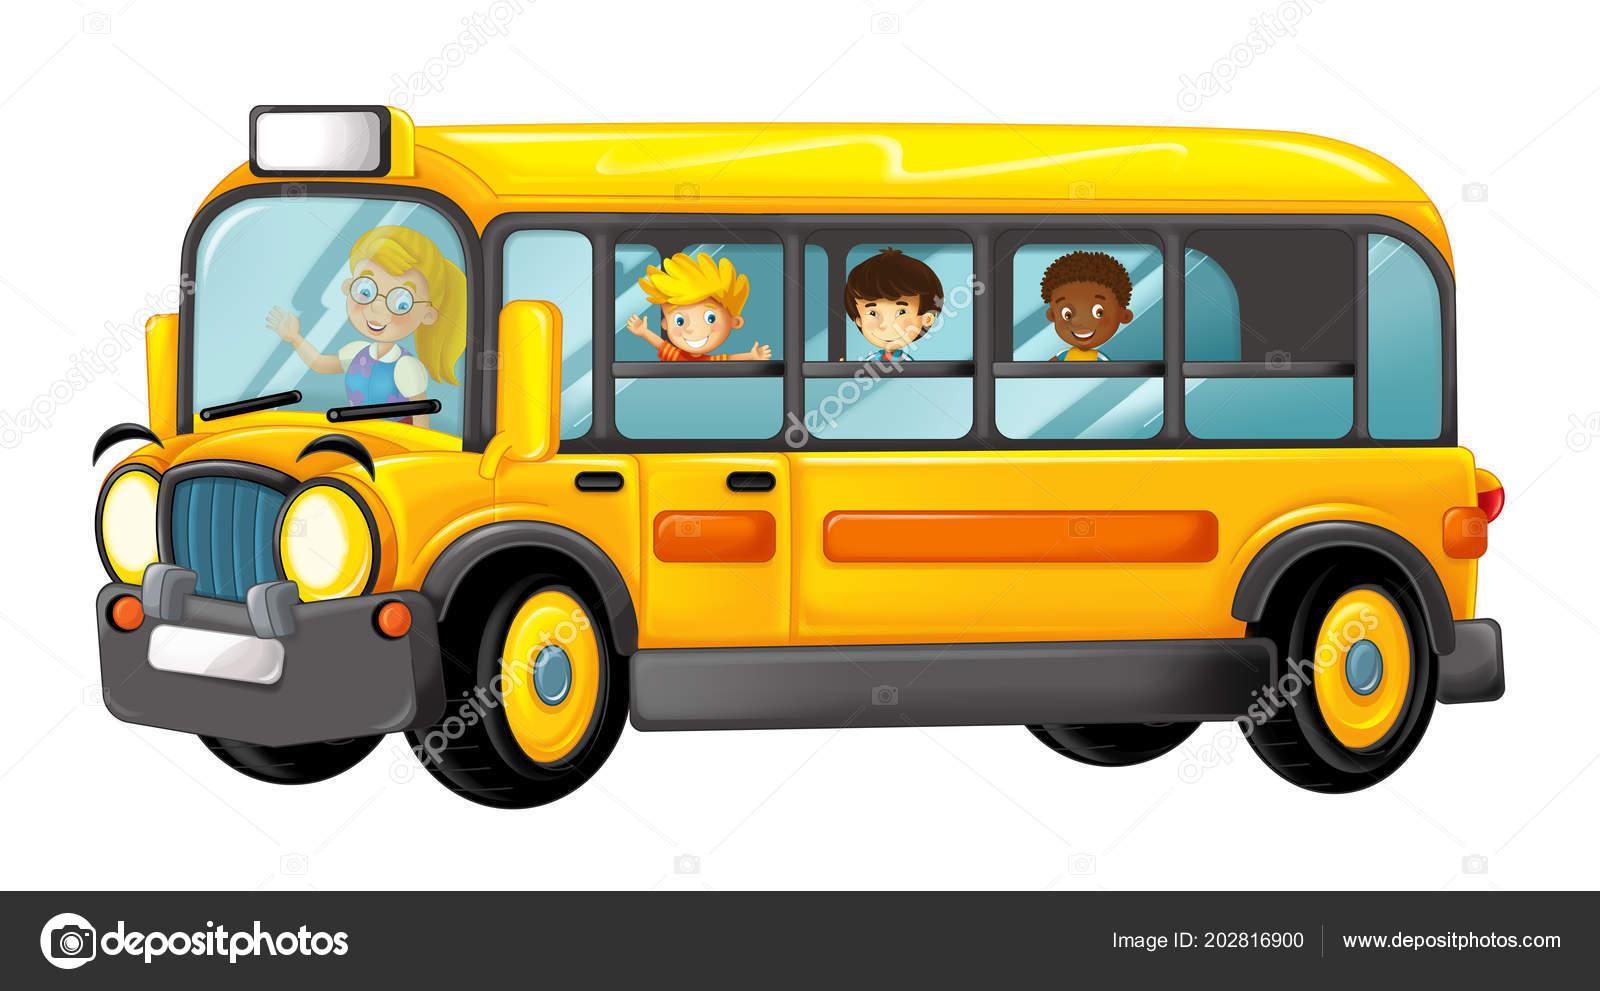 Bus Funny Cartoon Jaune Regardant Avec Eleves Illustration Pour Les